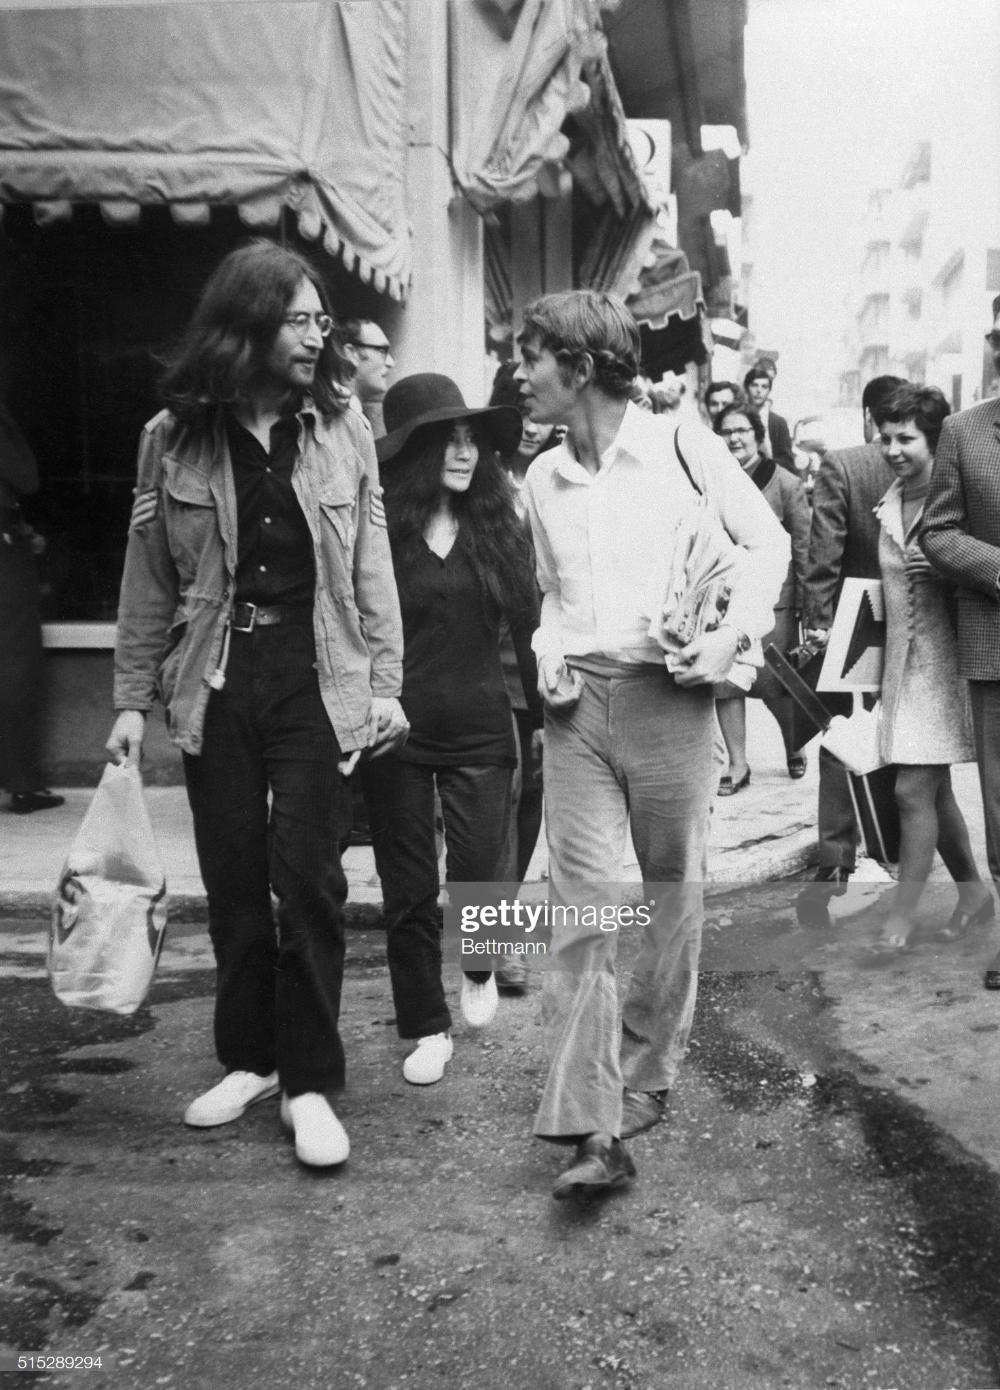 Musician John Lennon Strolls With His Wife Yoko Ono And His Greek John Lennon And Yoko John Lennon John Lennon Yoko Ono